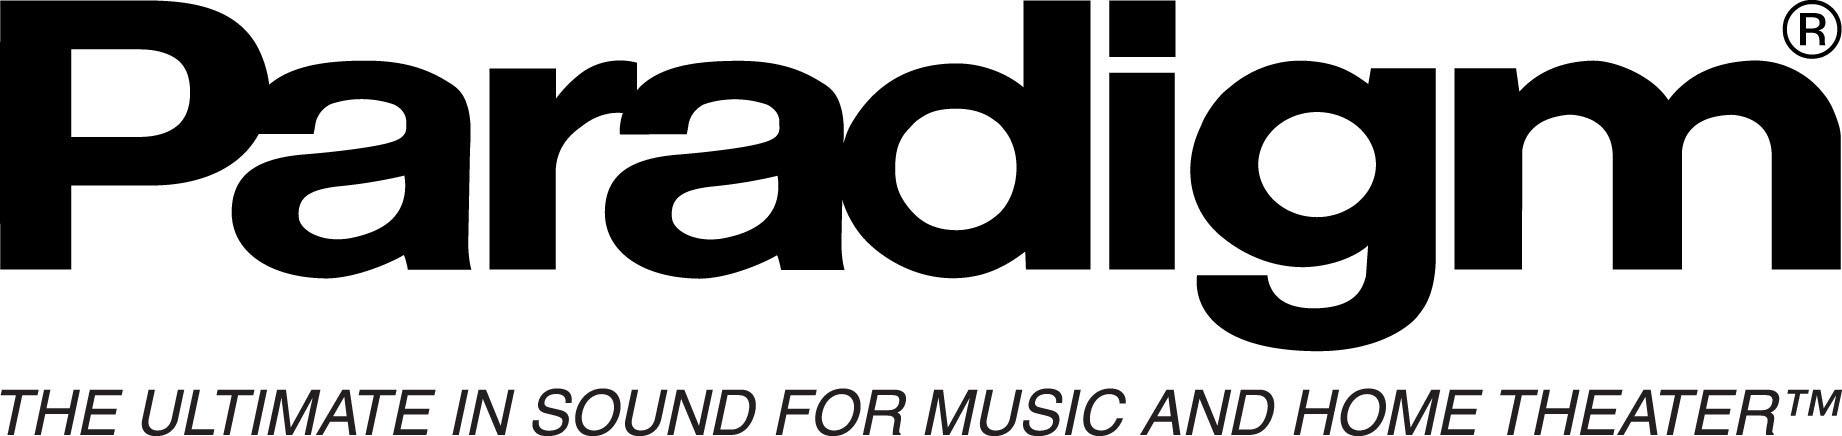 Paradigm Logo for Warehouse Management Systems Testimonial